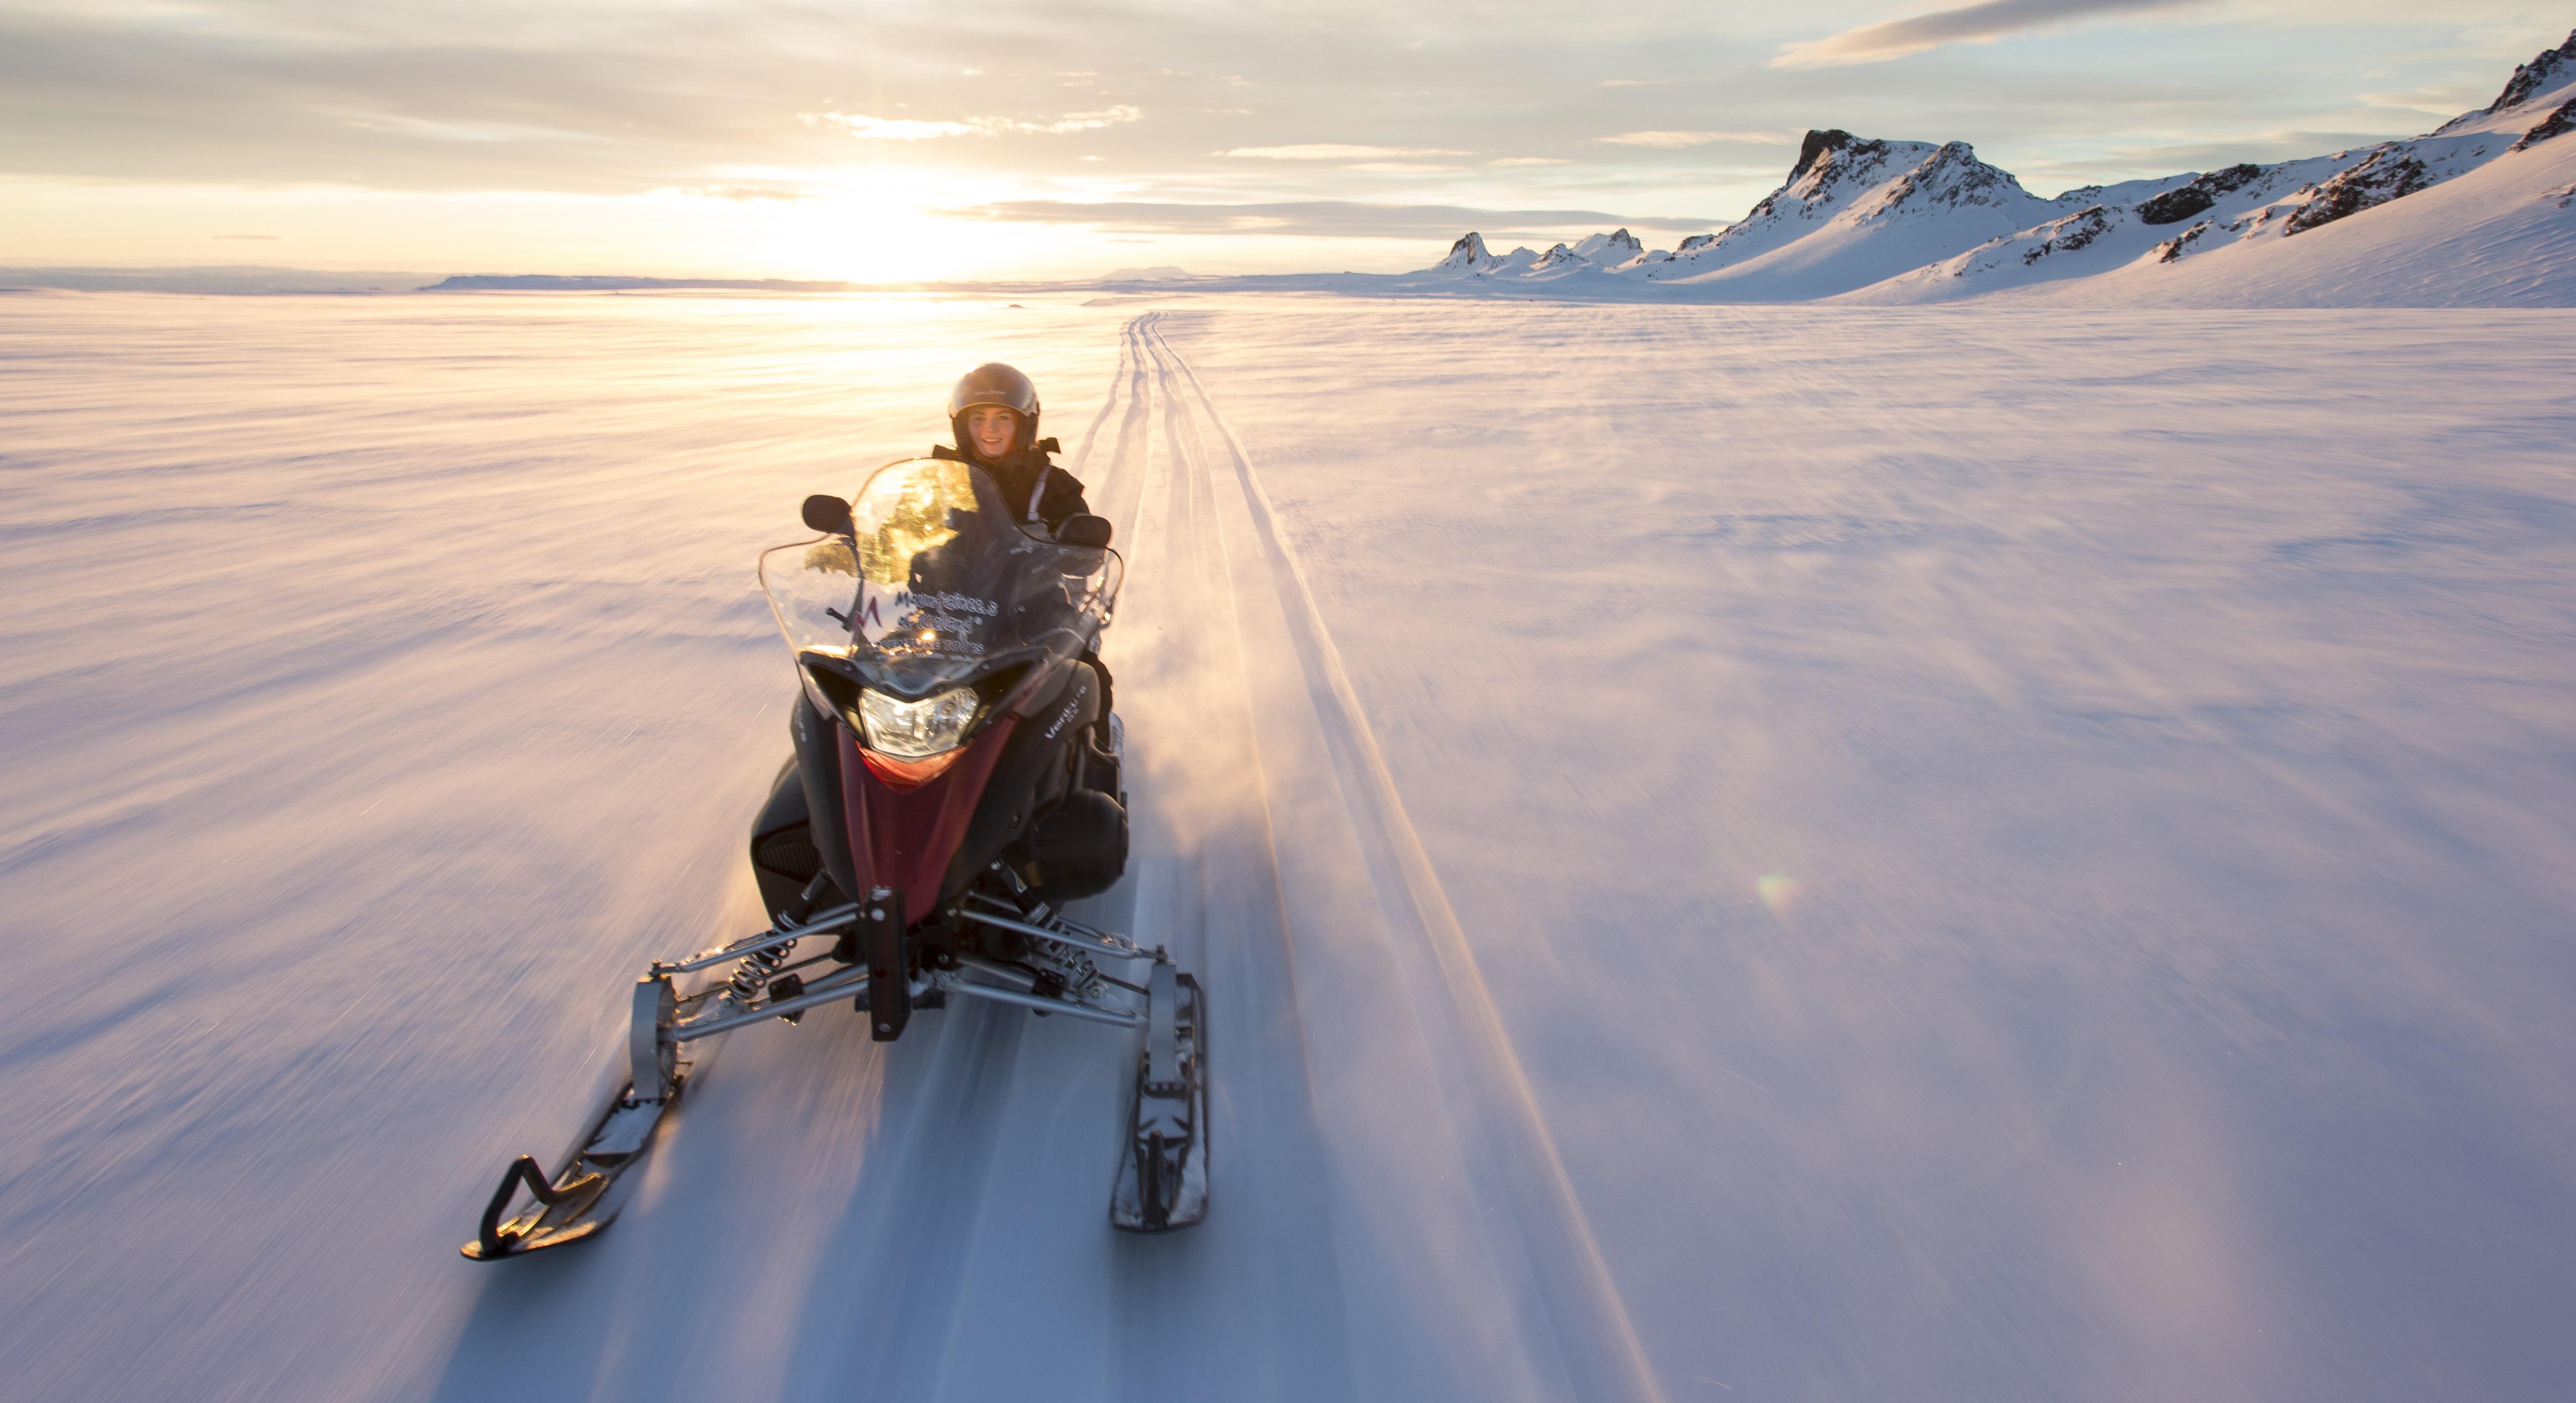 Goditi la tua avventura in motoslitta sulla cima del ghiacciaio Langjökull in Islanda.